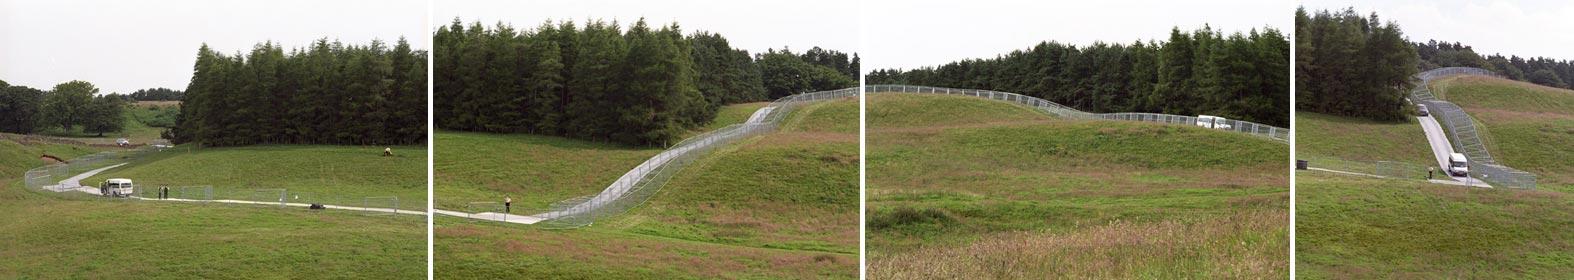 G8_fence_4.jpg